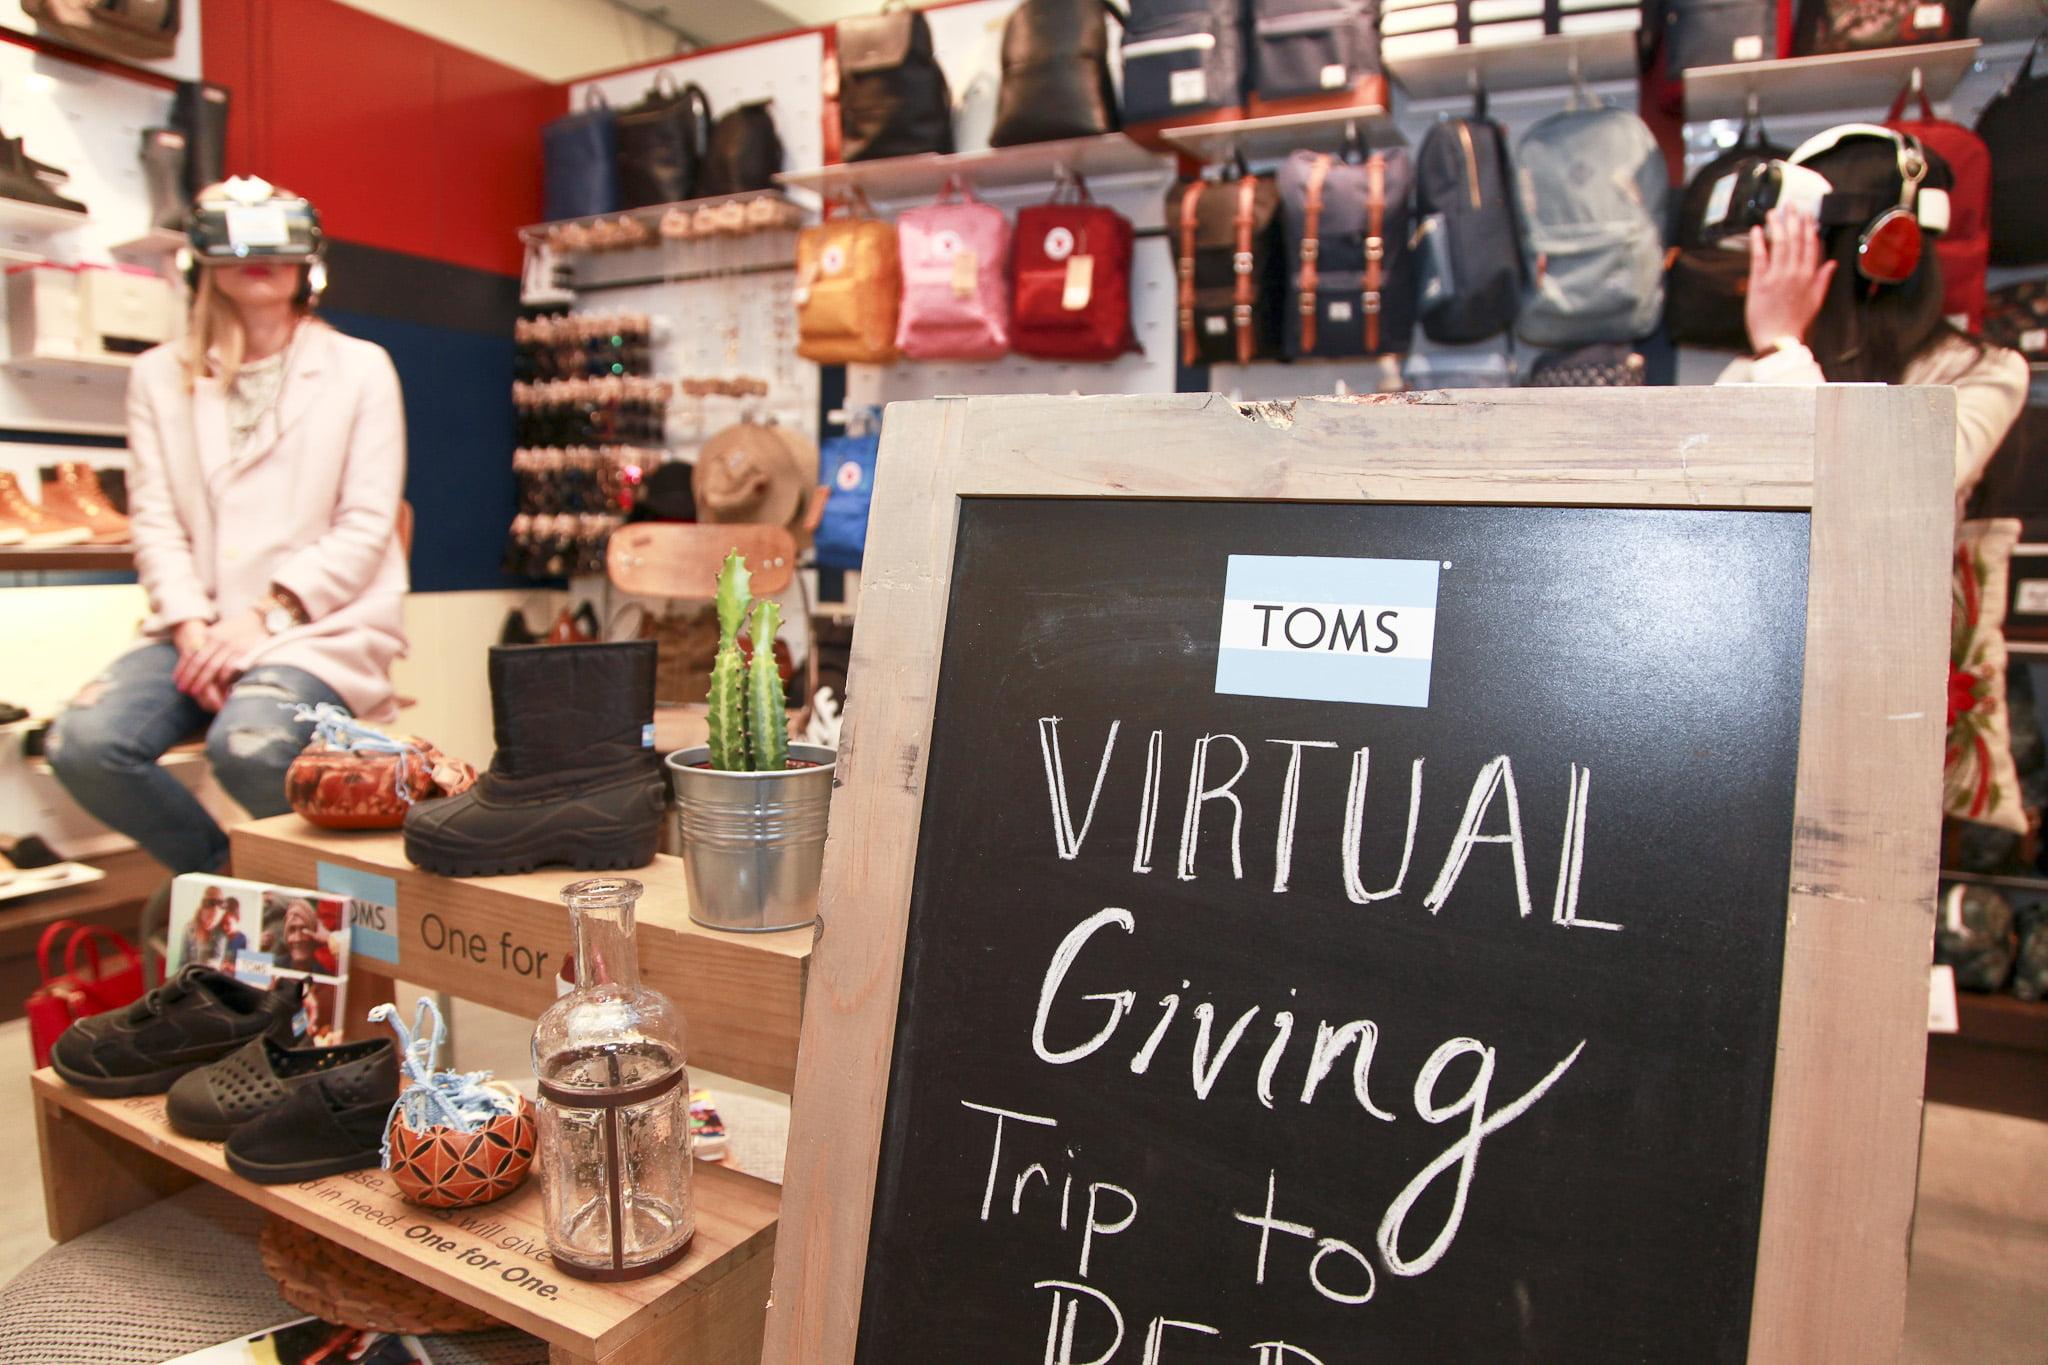 Toms Virtual Reality giving